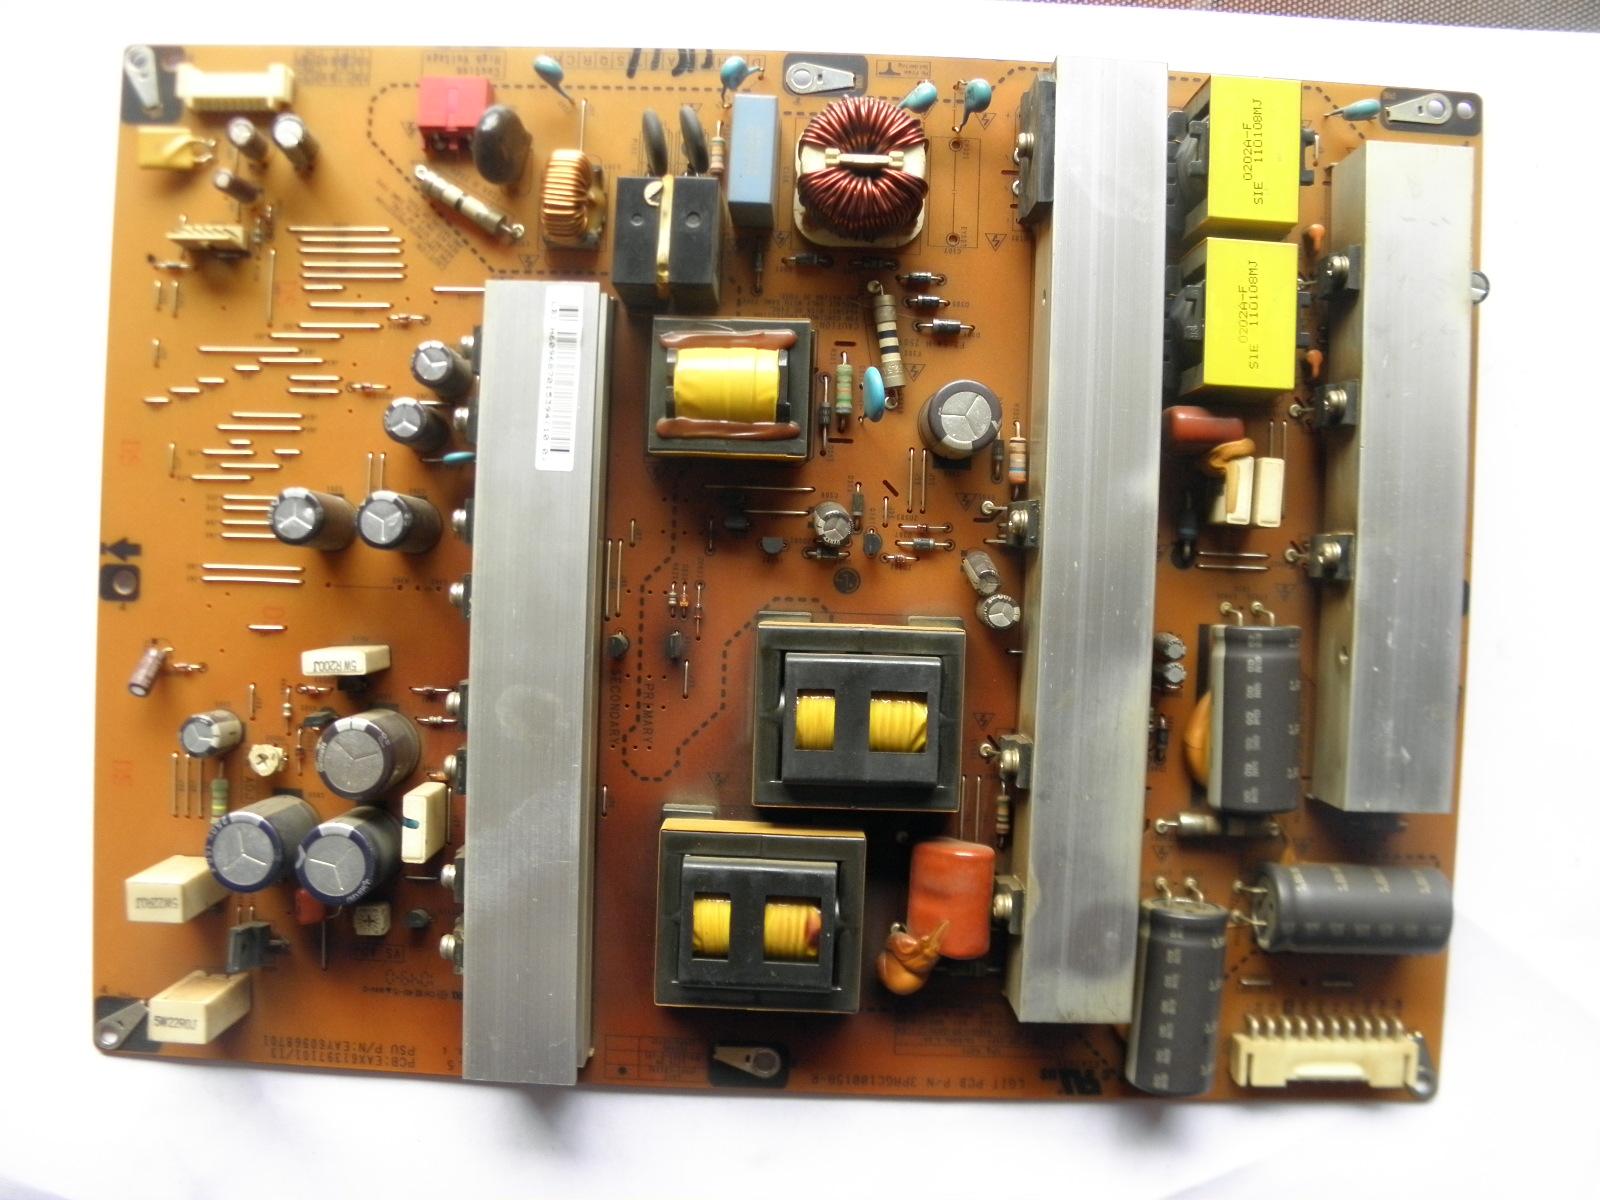 Original - LG50R3 LCD - TV, LCD - TV EAX61397101/13EAY60968701 macht.